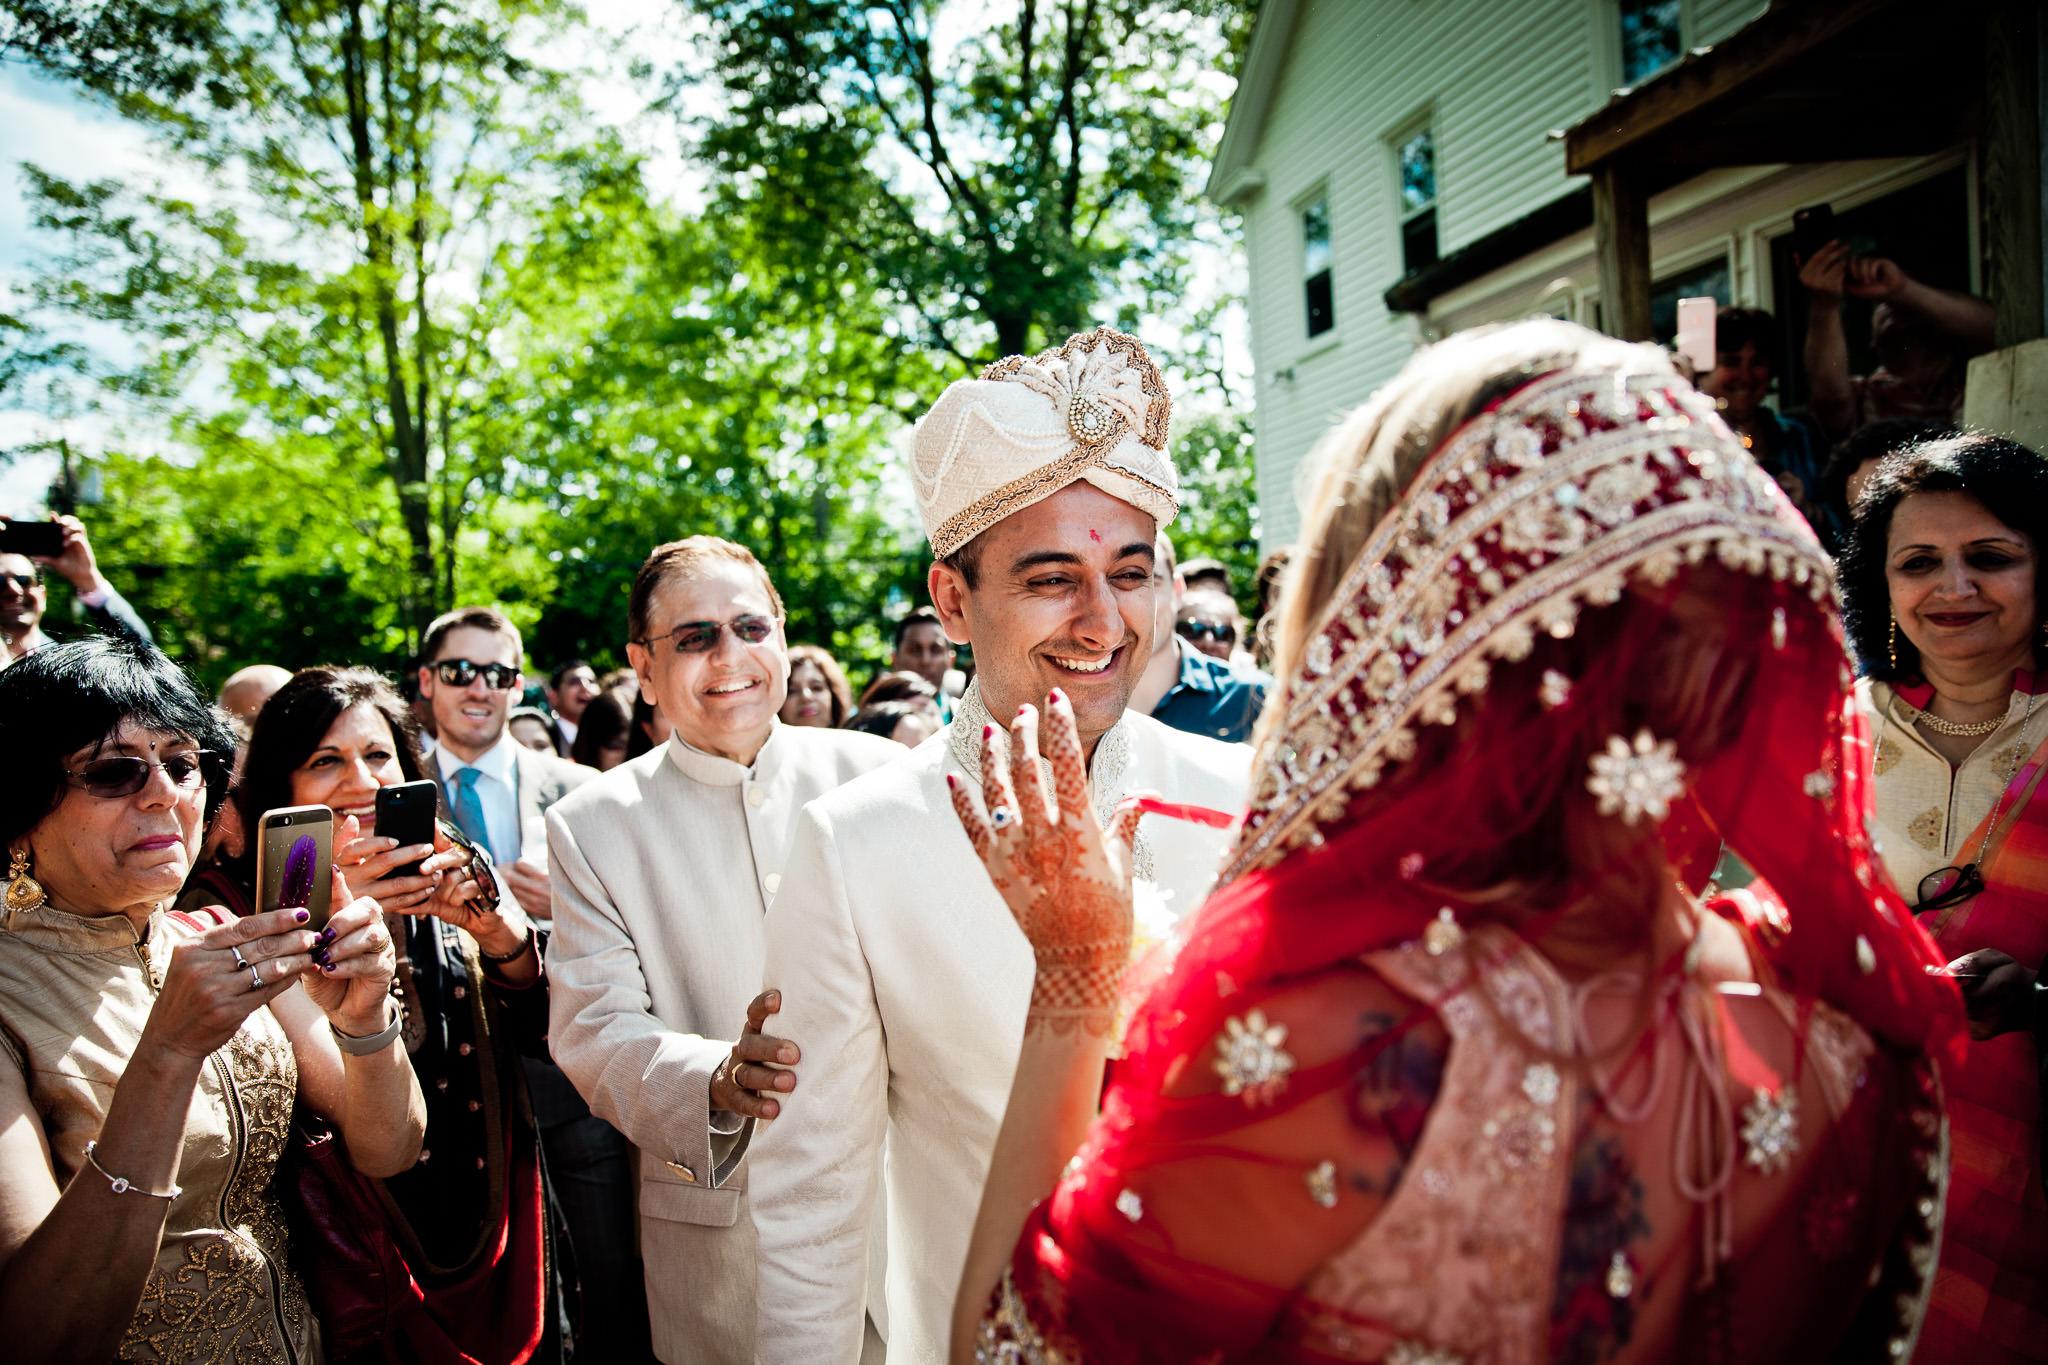 032_Canada-documentary-wedding-photograp